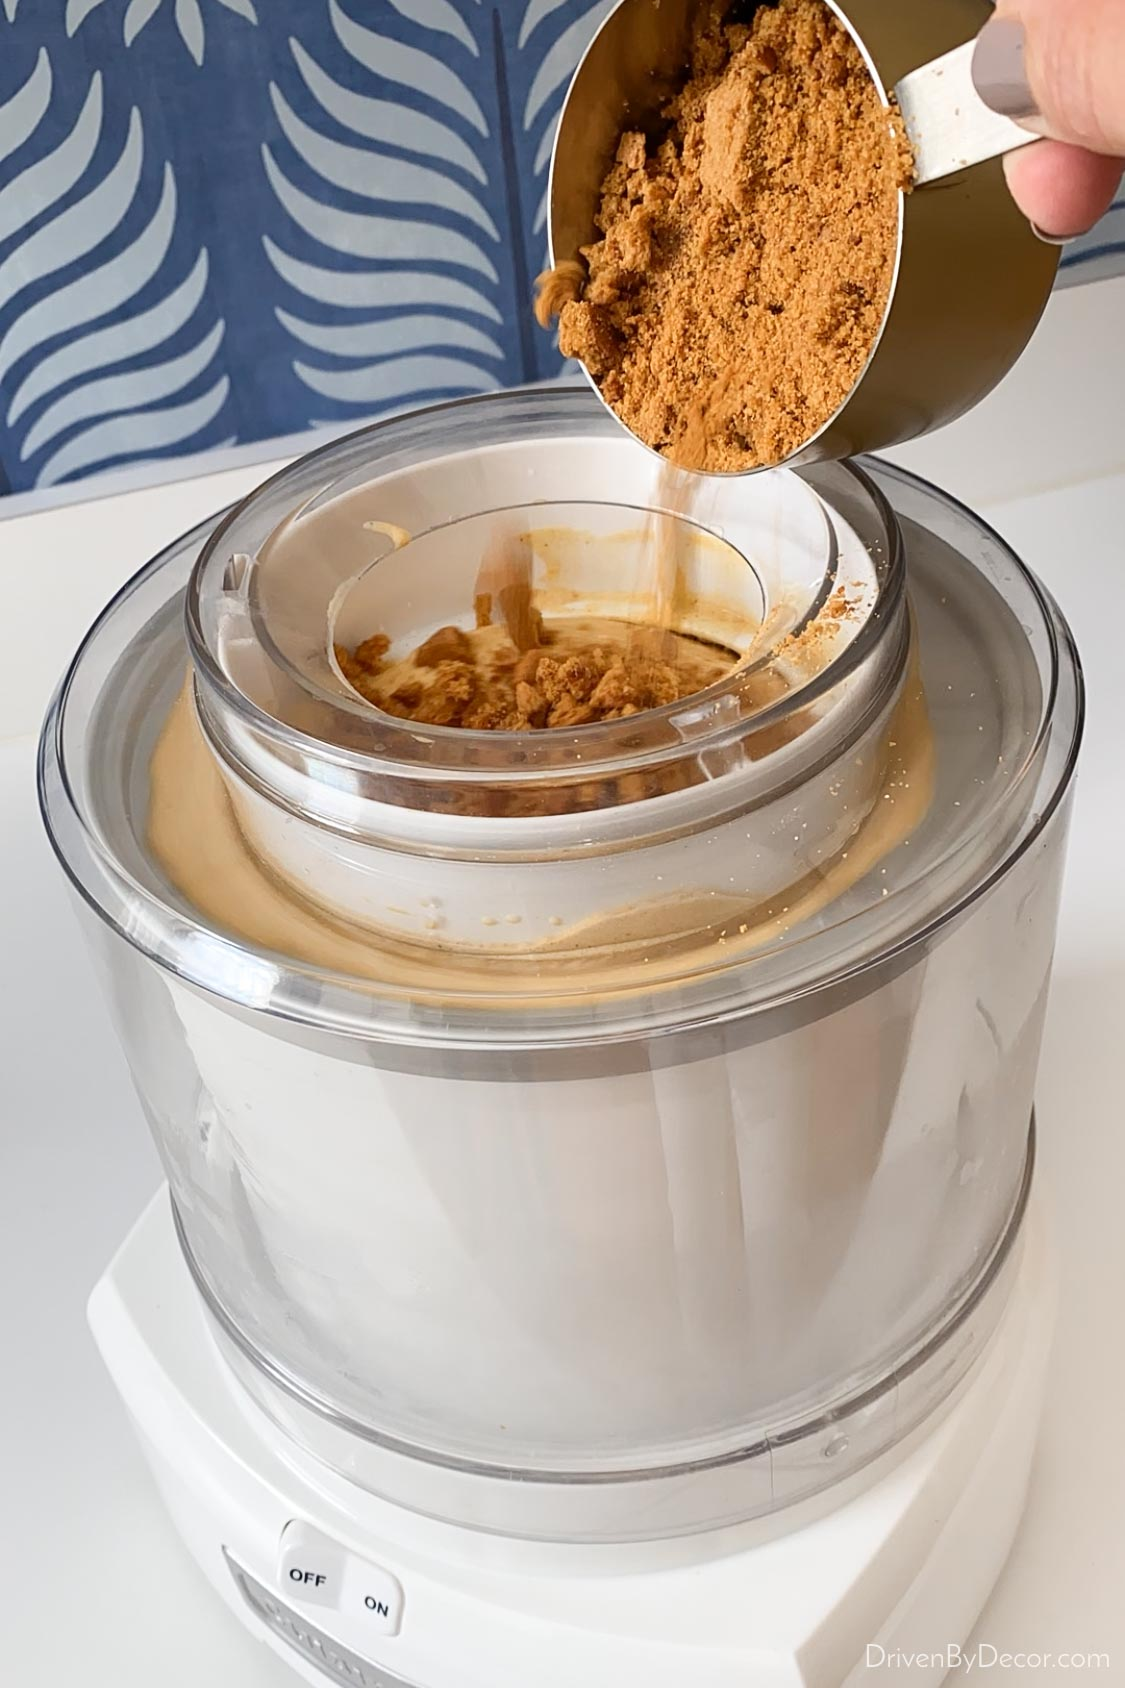 This ice cream maker makes the BEST ice cream!